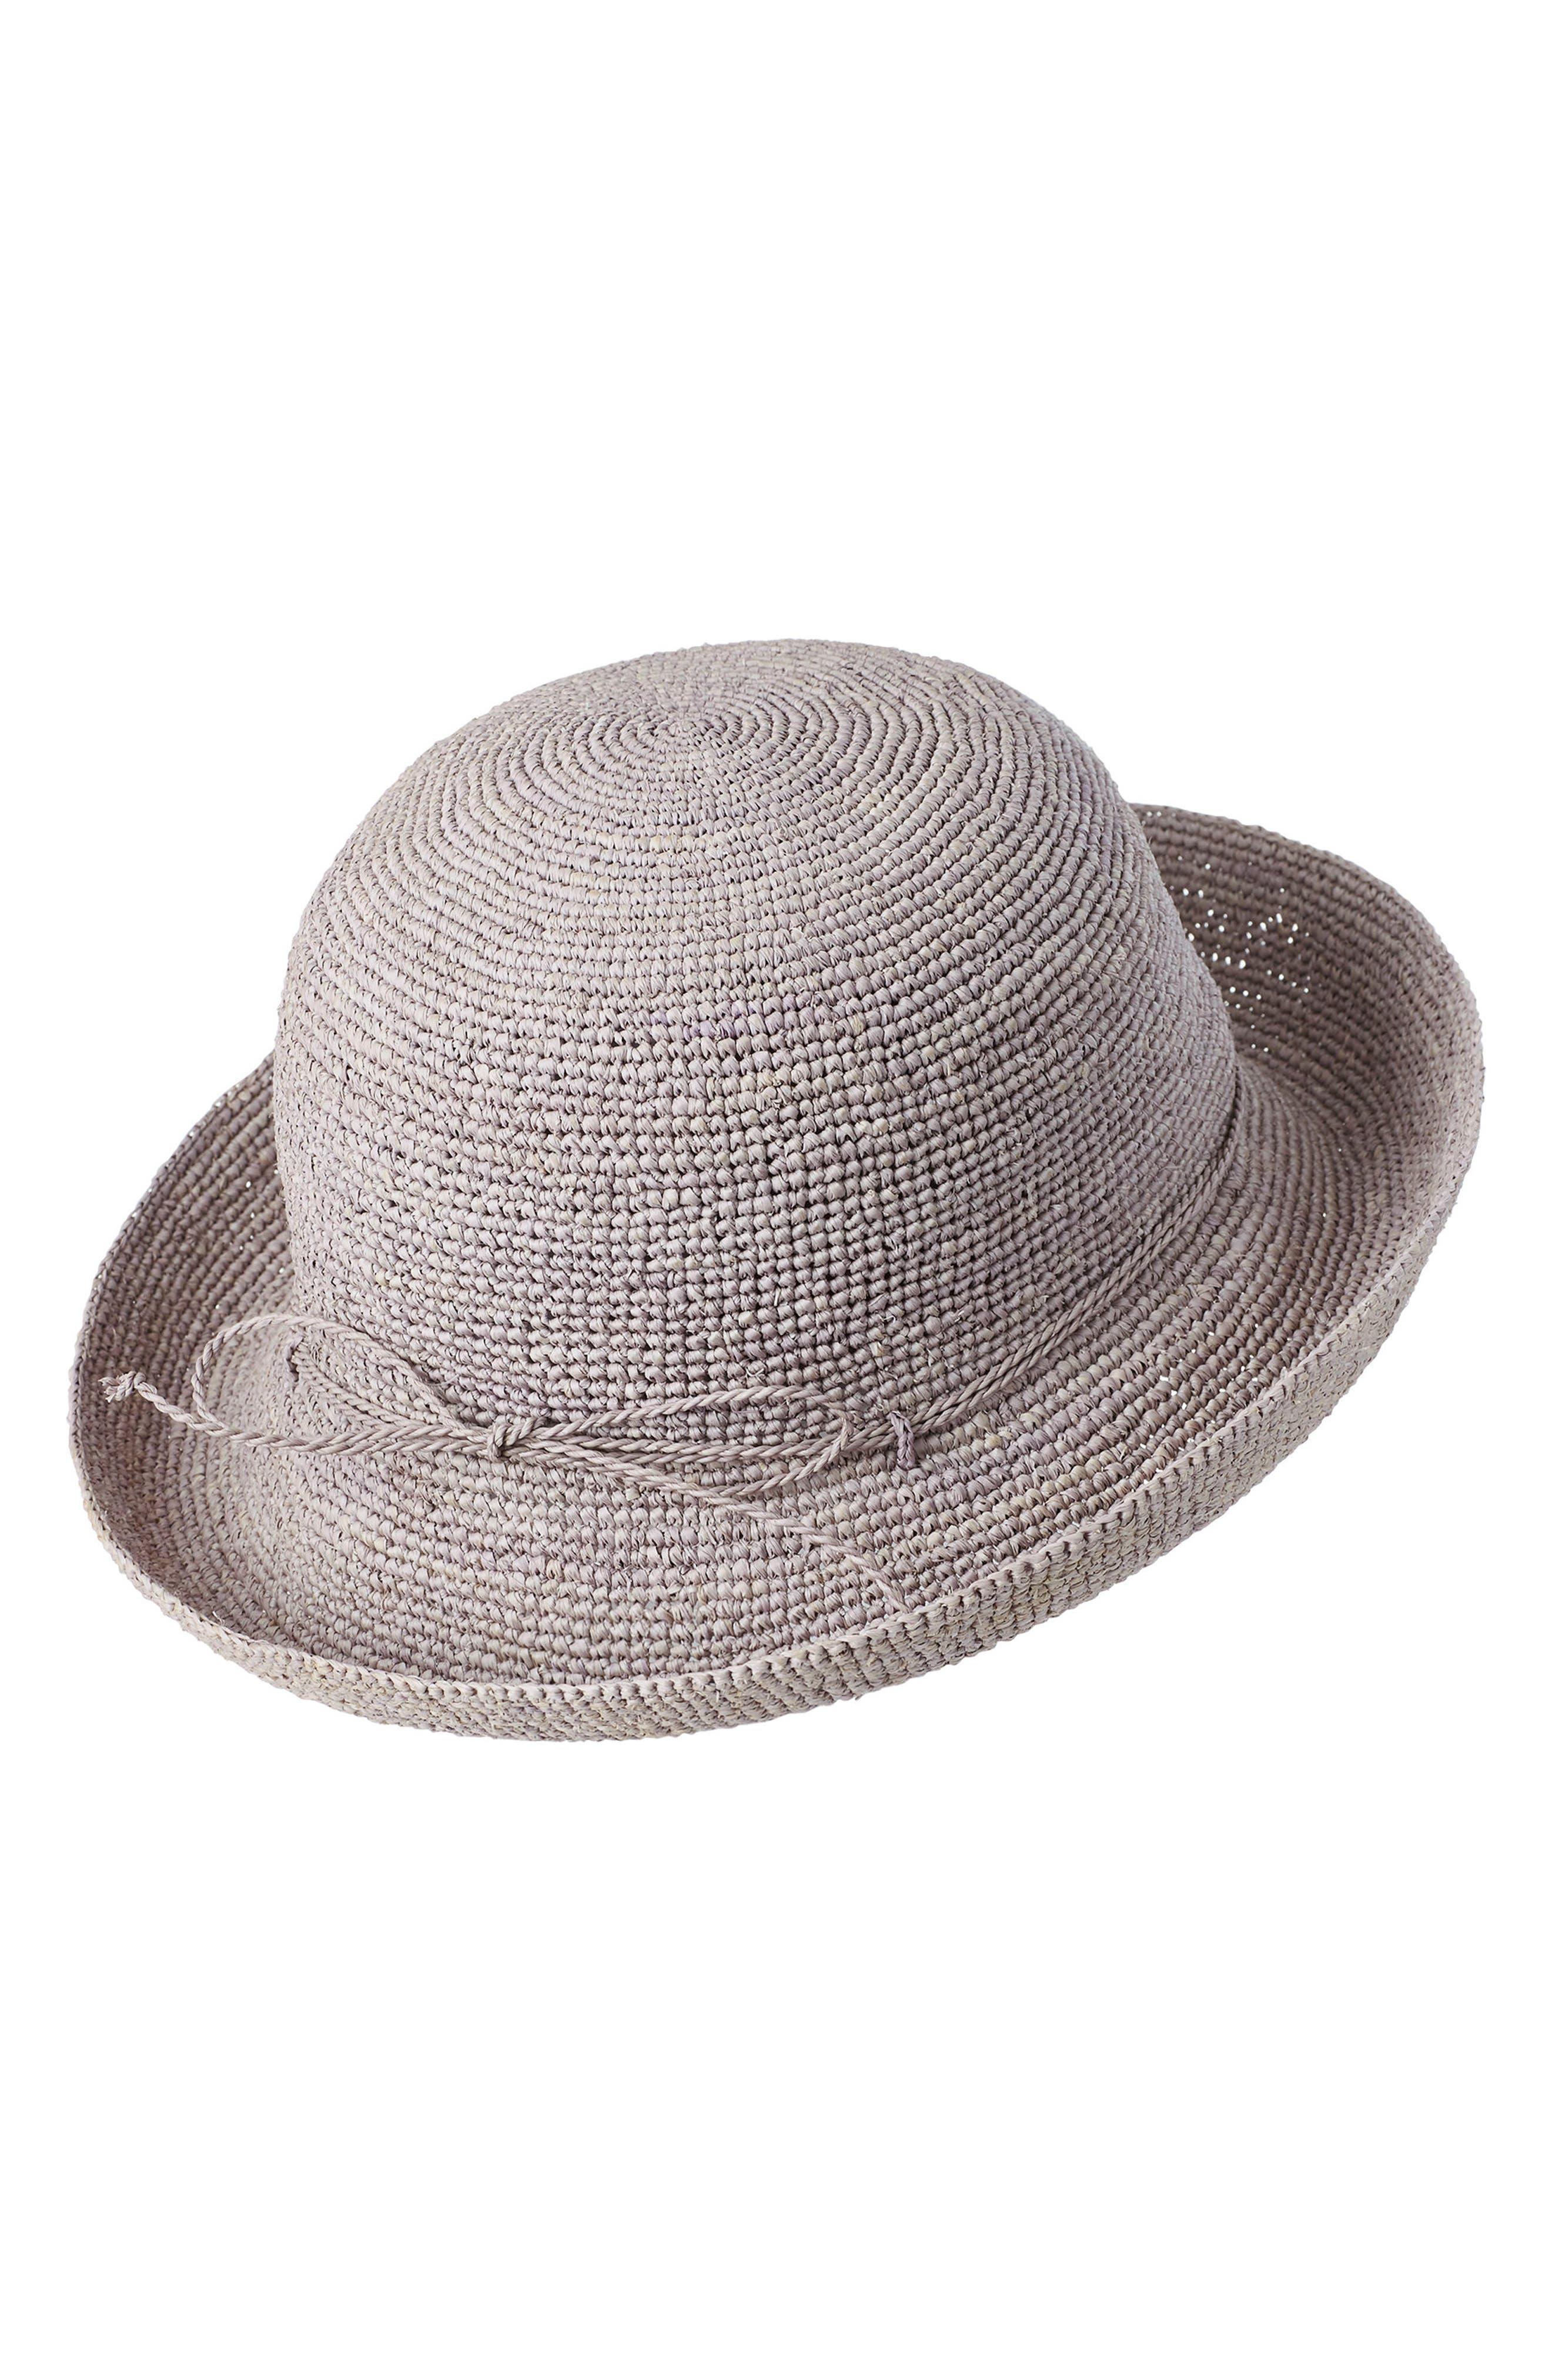 Alternate Image 1 Selected - Helen Kaminski Classic Upturn Crocheted Raffia Hat